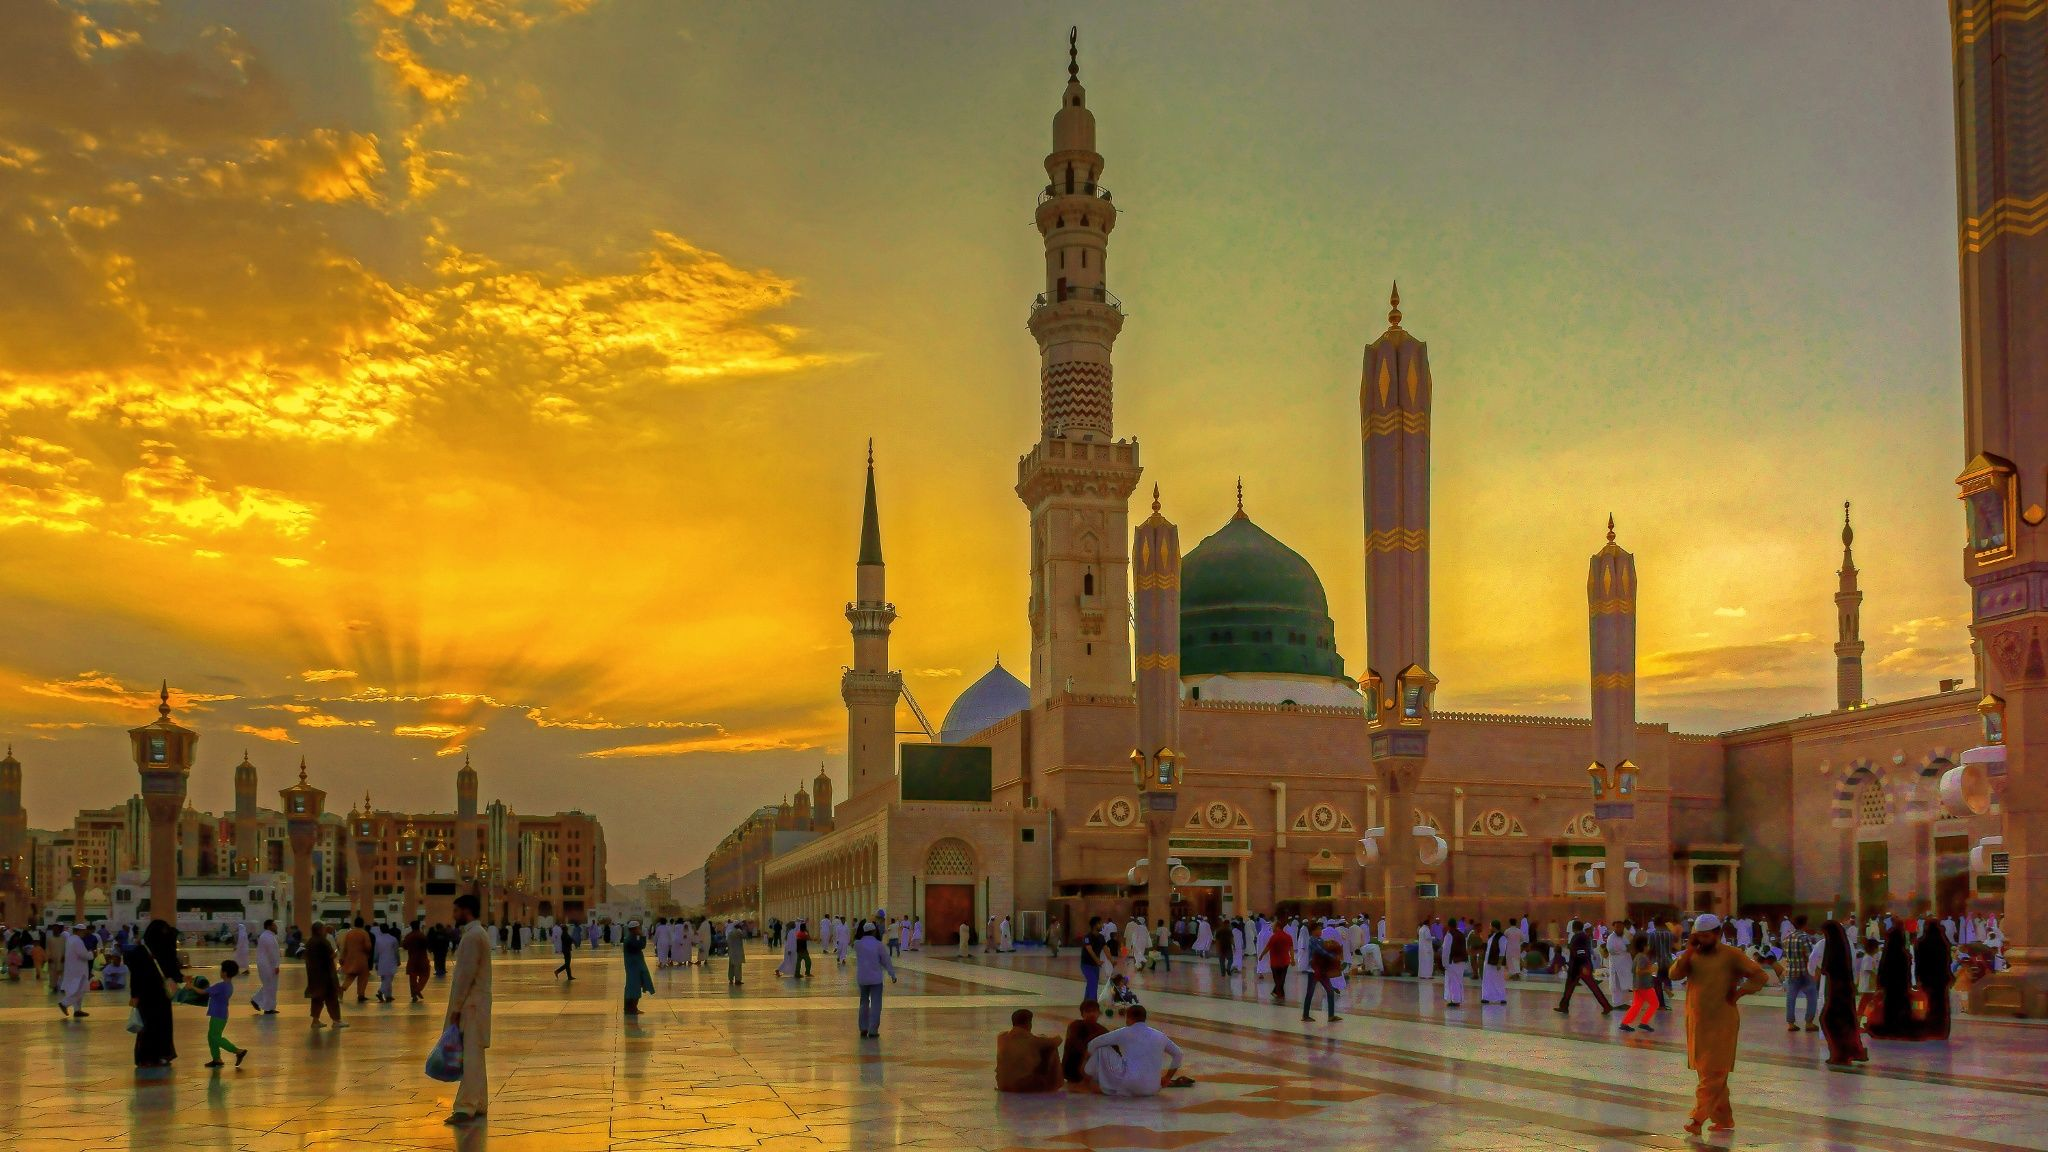 المسجد النبوي By Mohammed Abdo 500px Beautiful Nature Scenes Medina Mosque Islamic Pictures